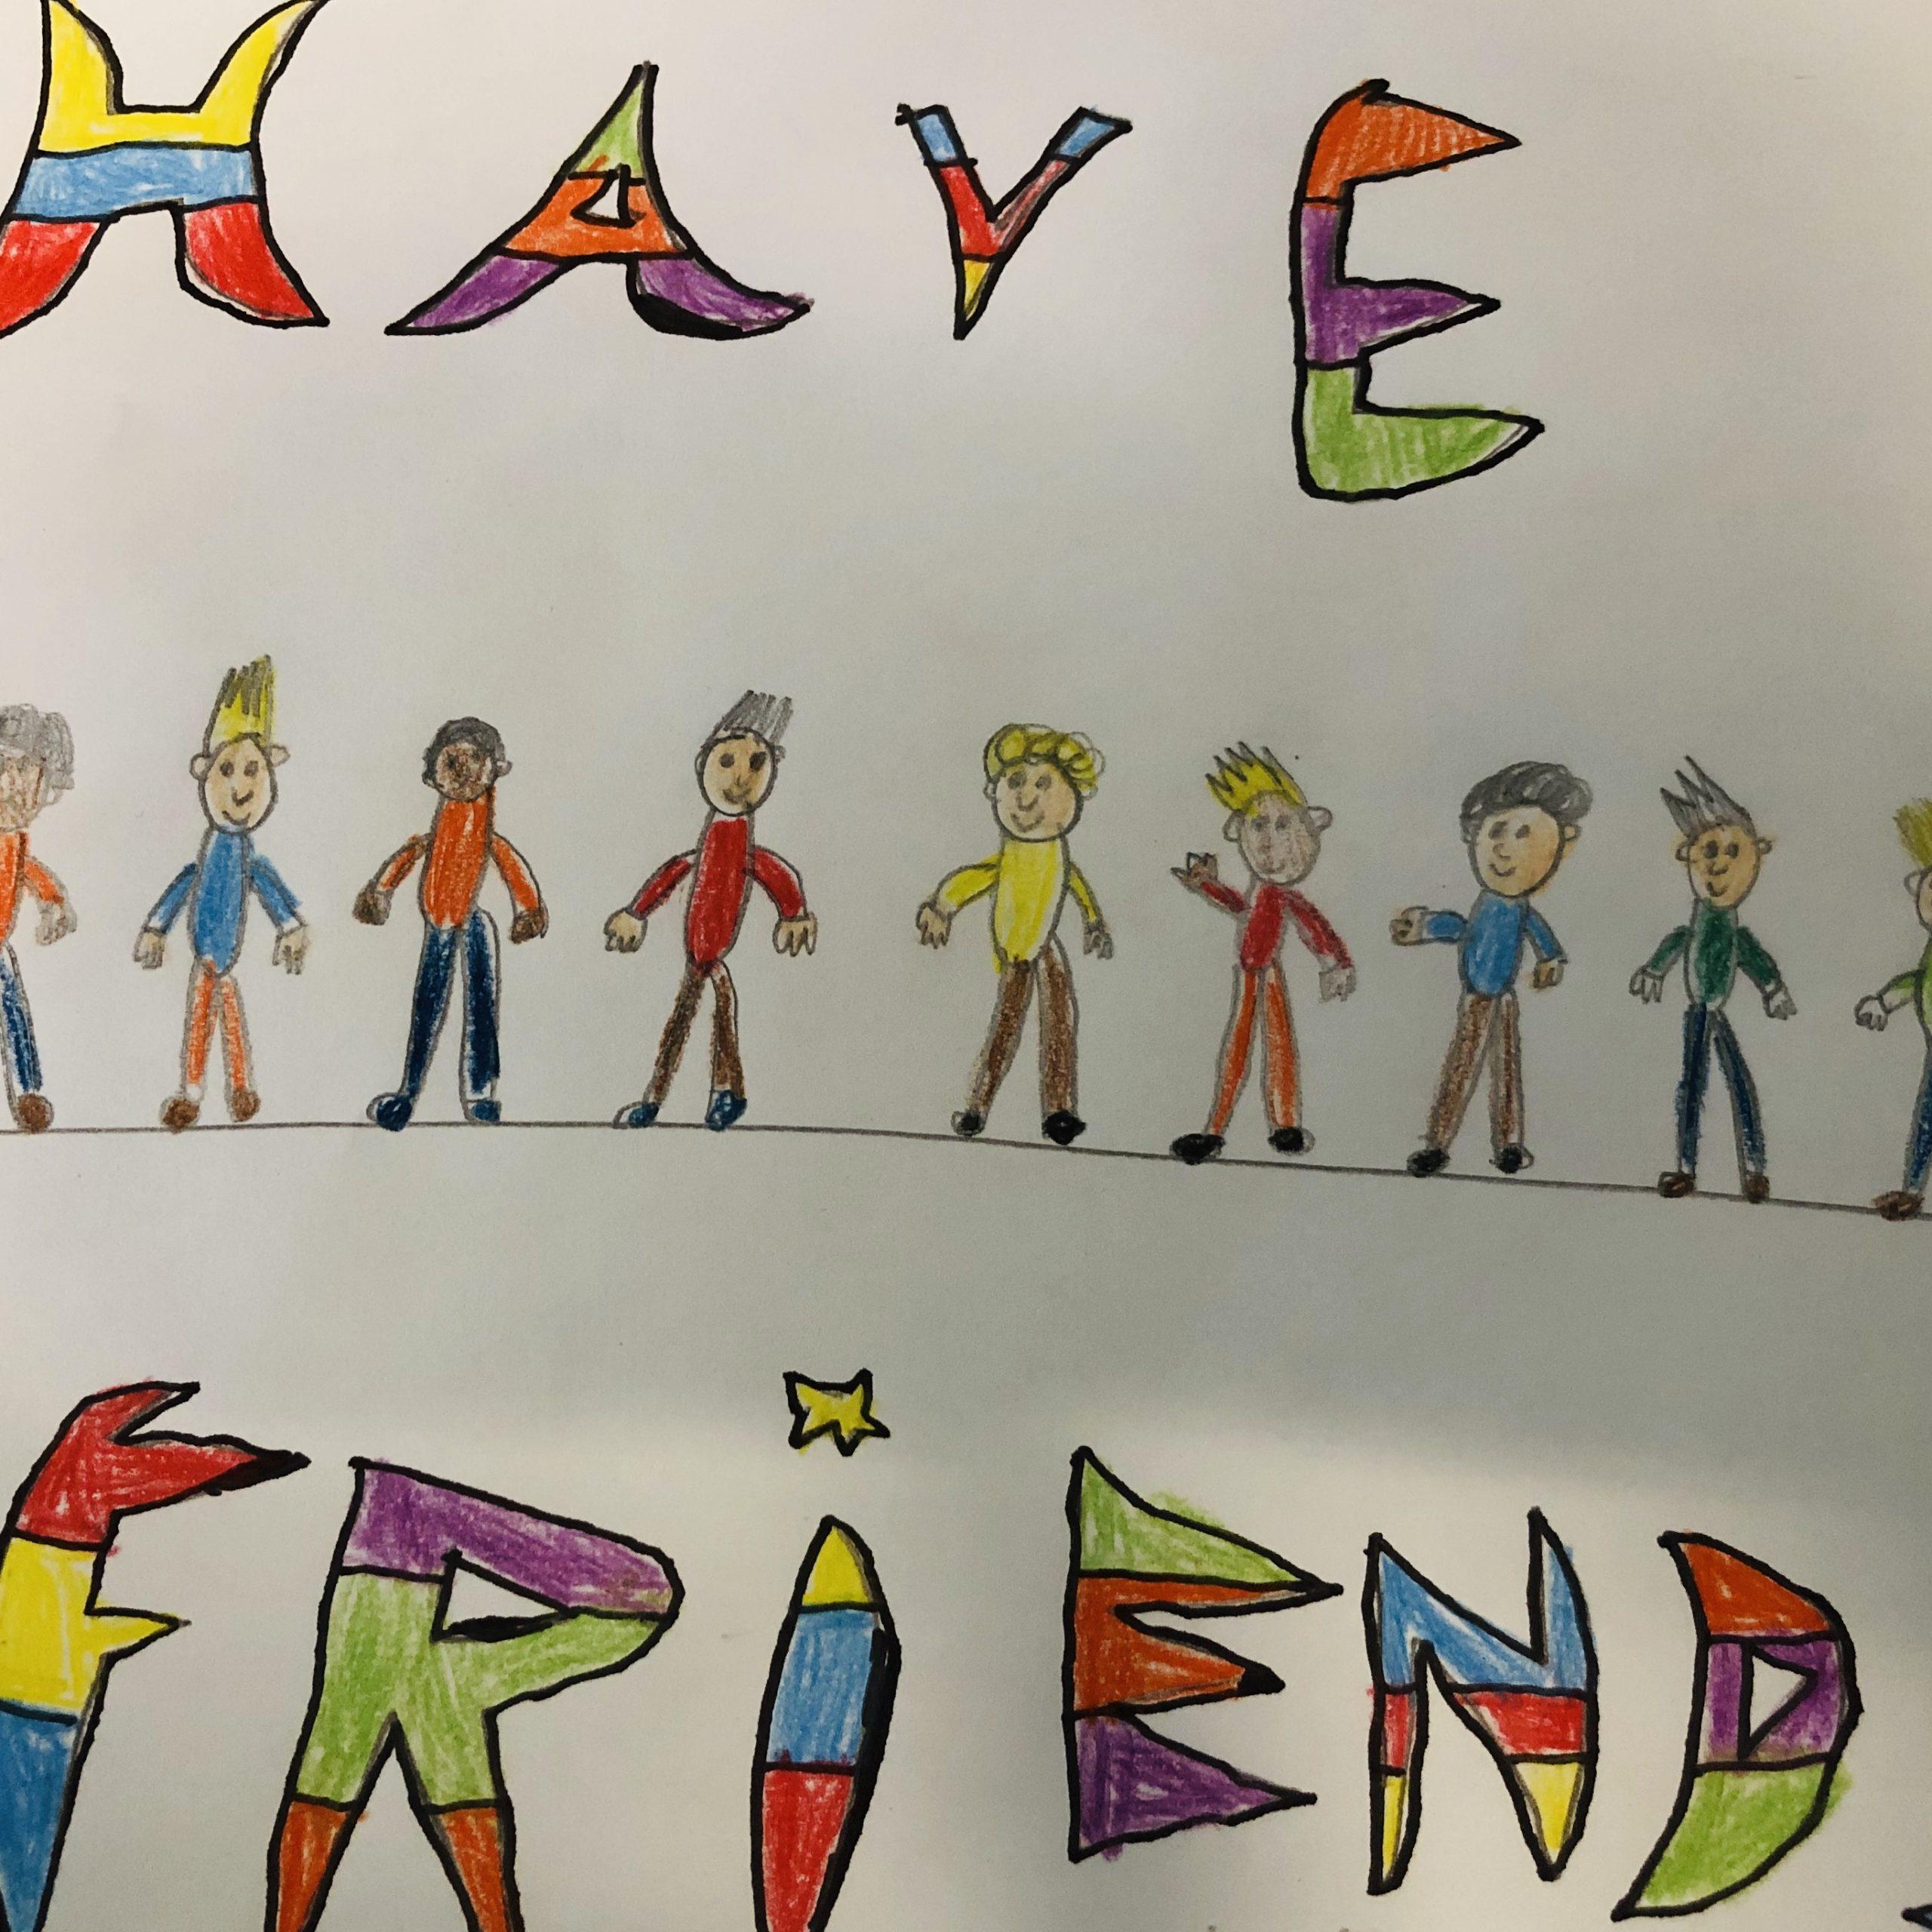 Happy International Day of Children's rights